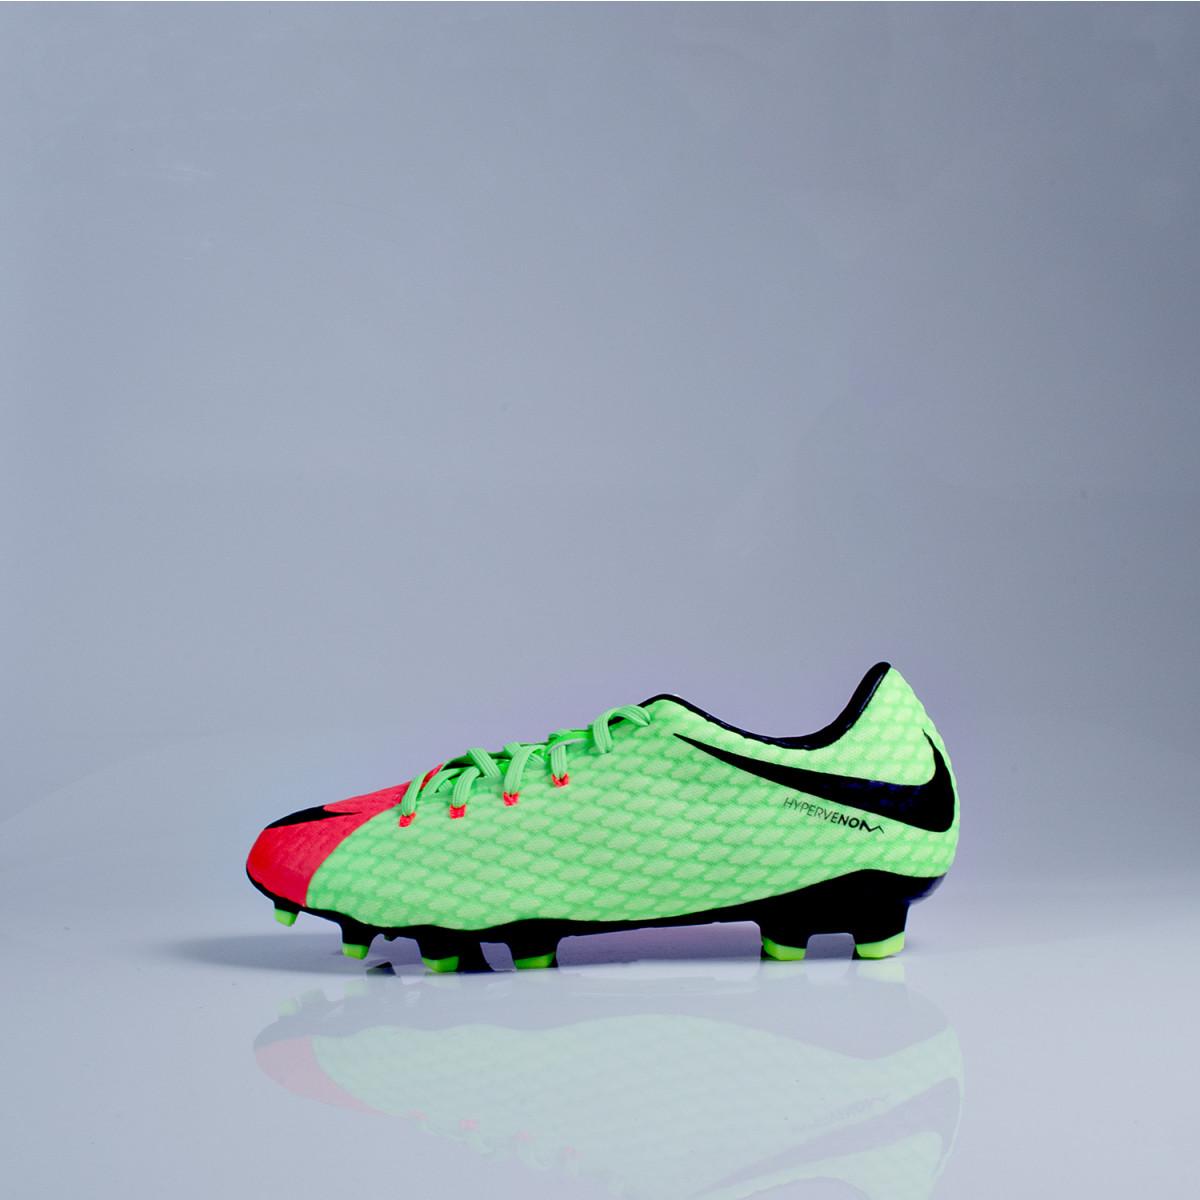 95da587430263 Botines Nike Hypervenom Phelon III FG - Ofertas - Colegial